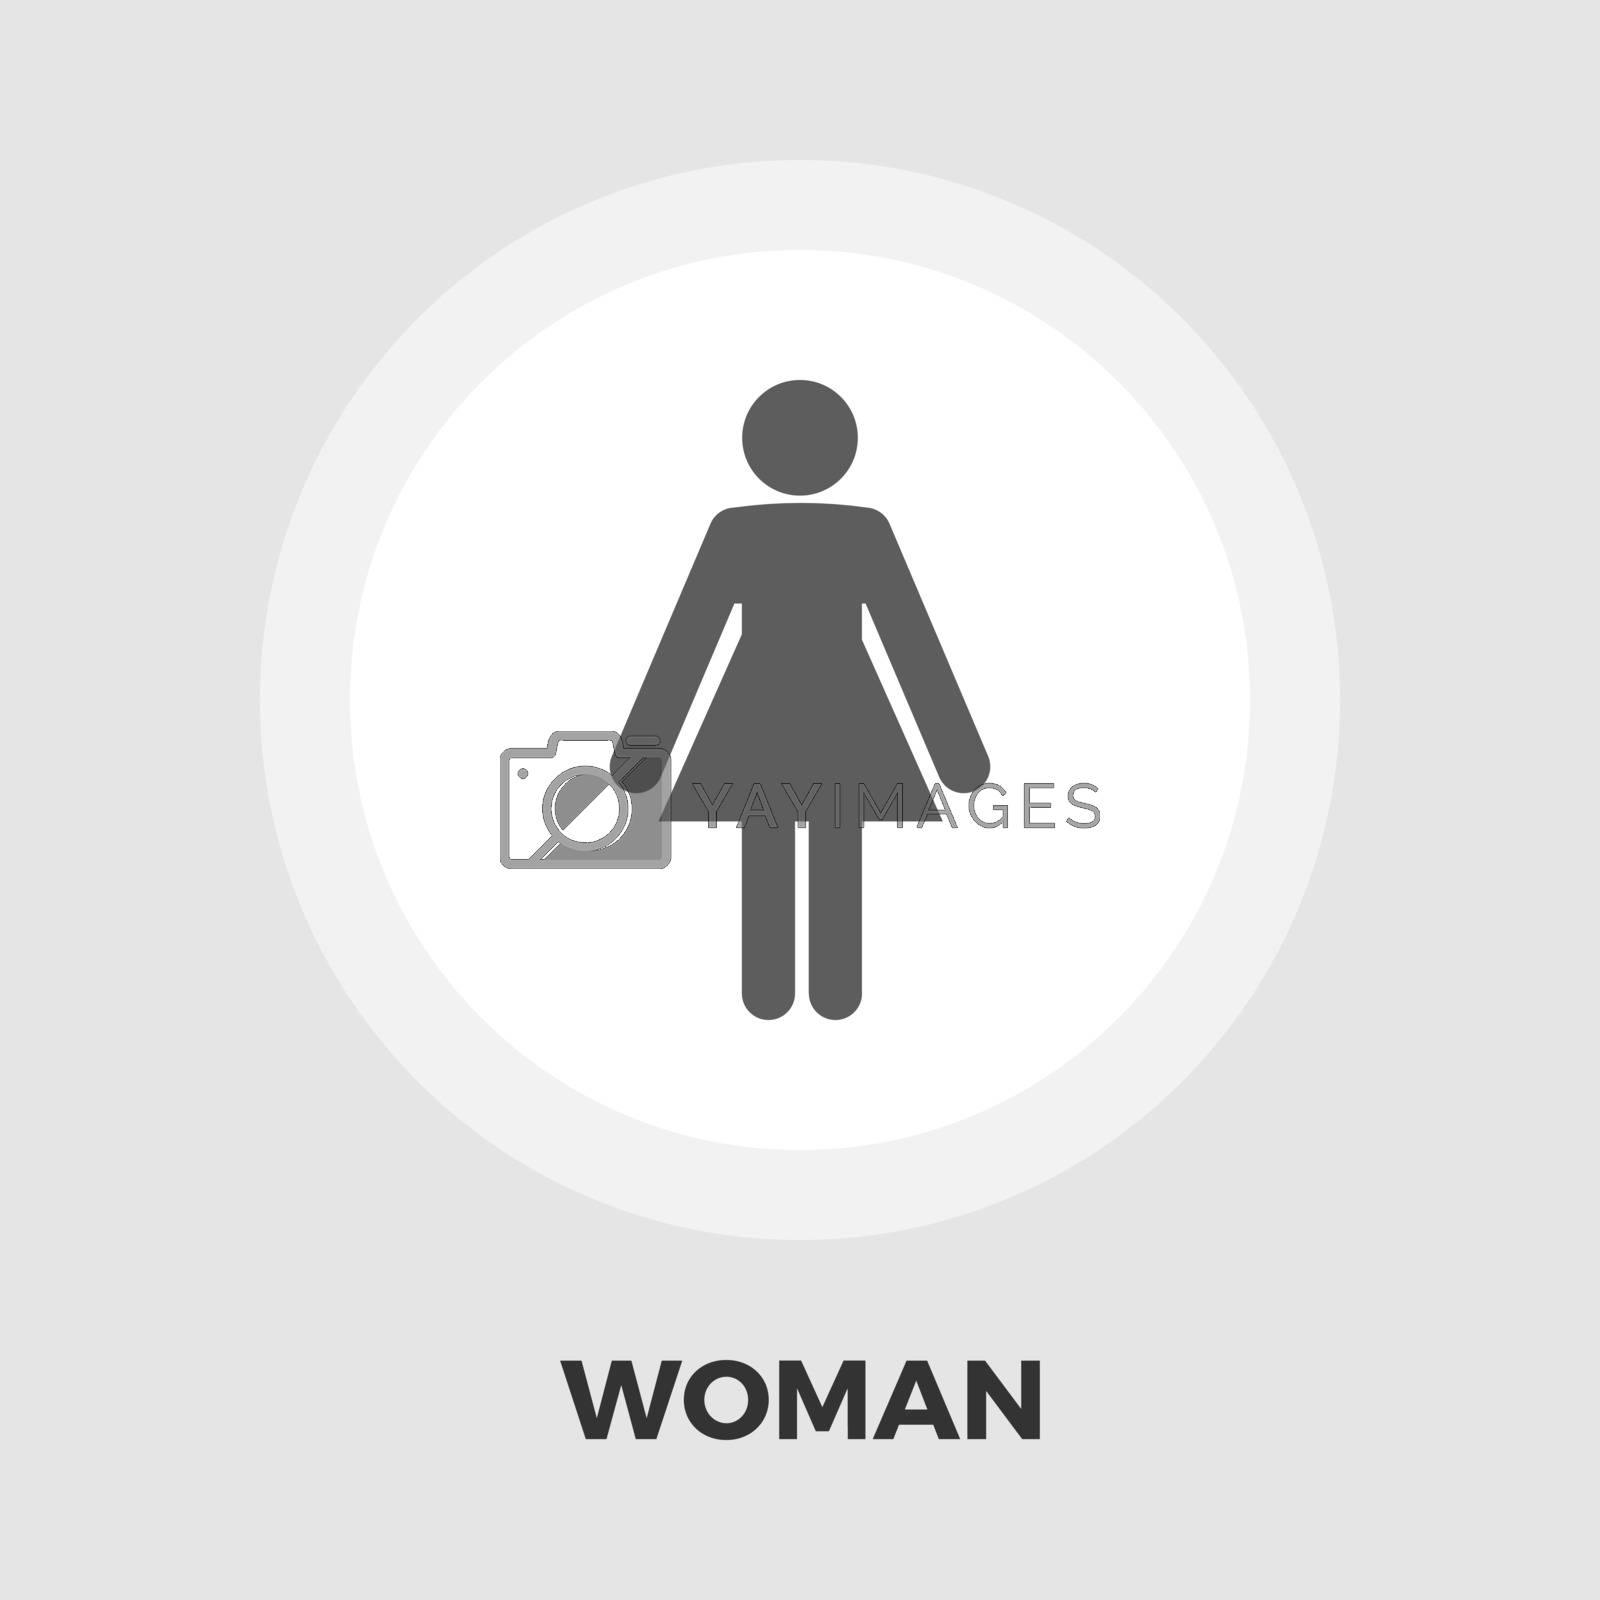 Female gender sign icon flat by smoki